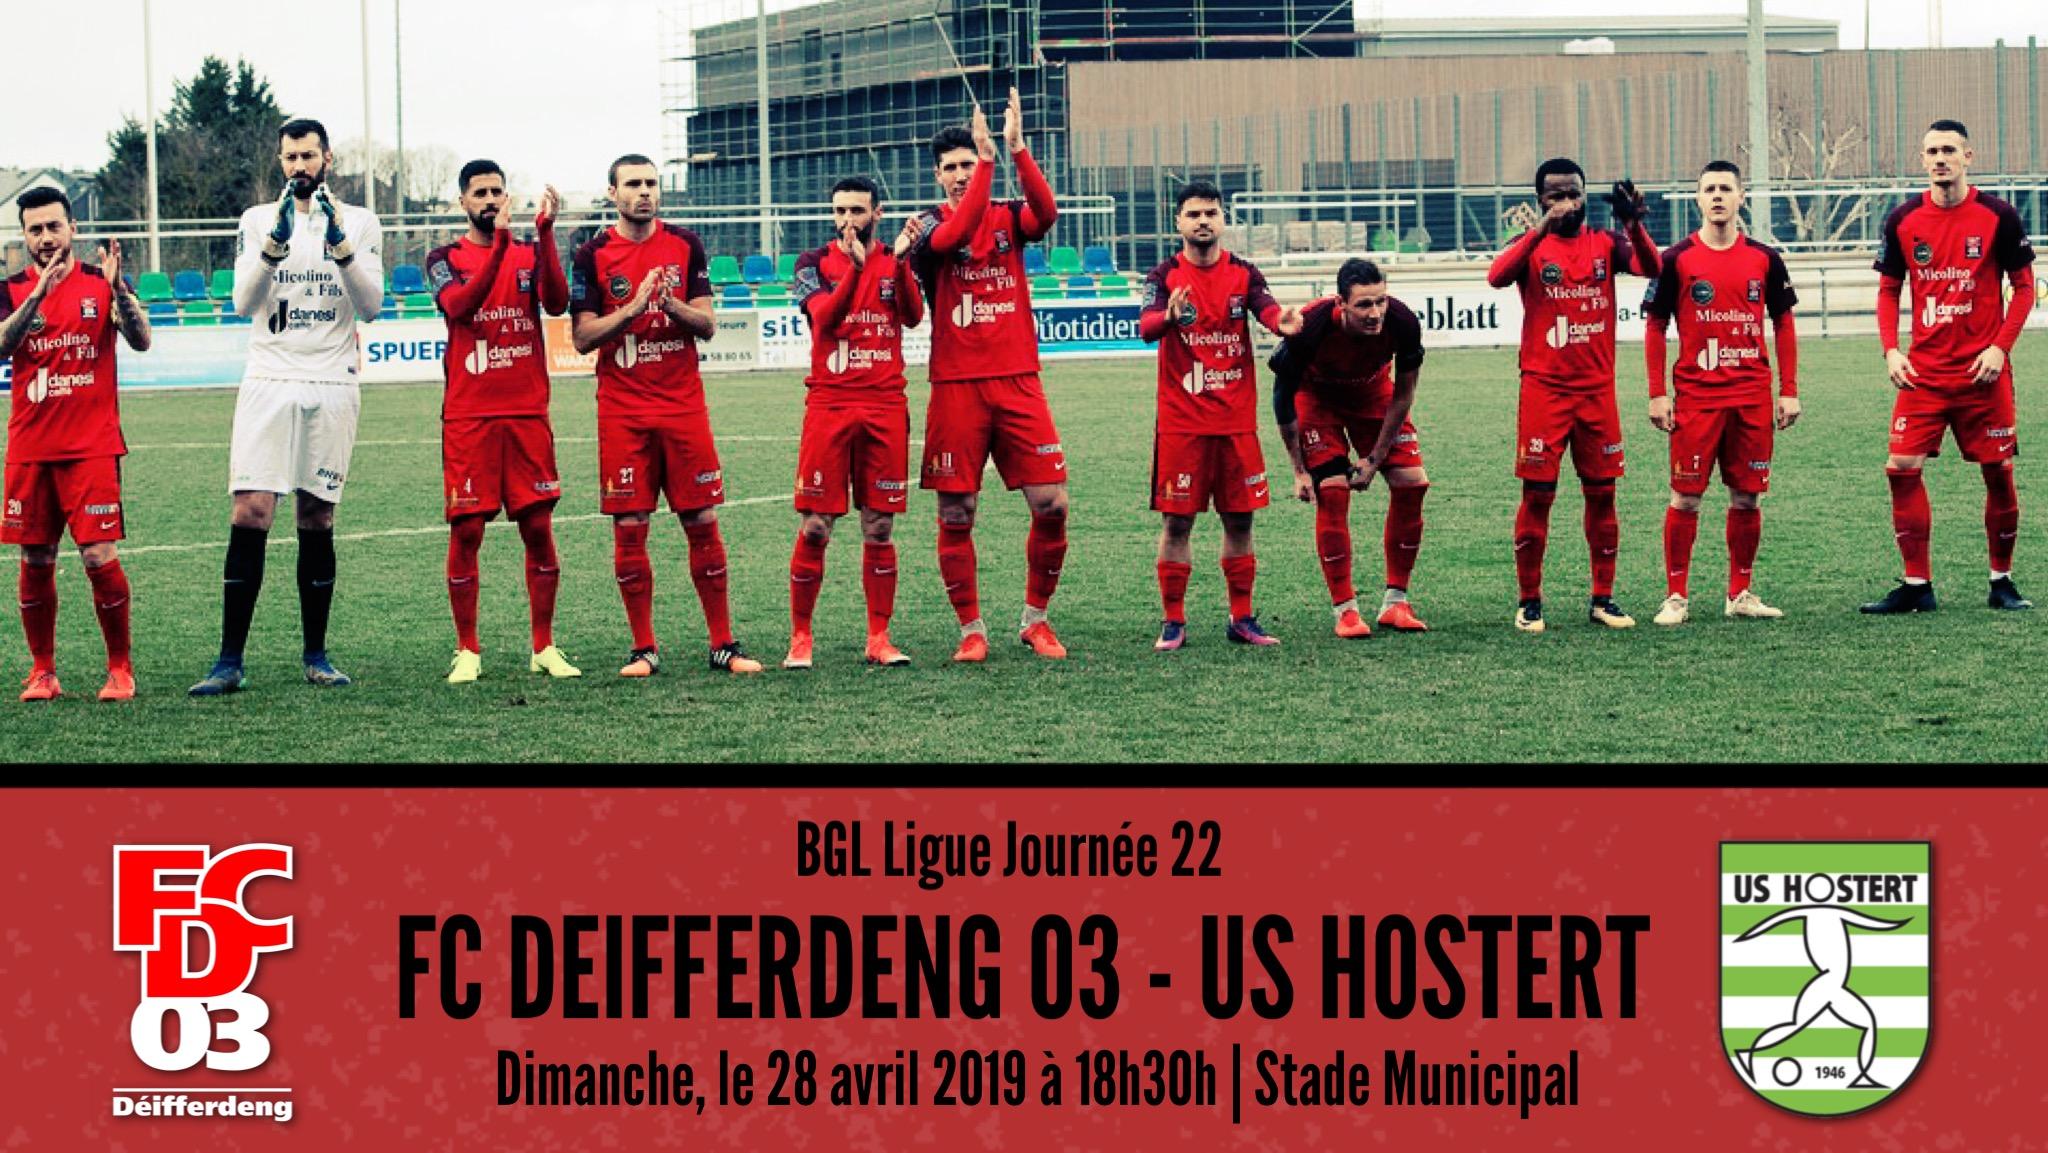 FC DEIFFERDENG 03 - US HOSTERT